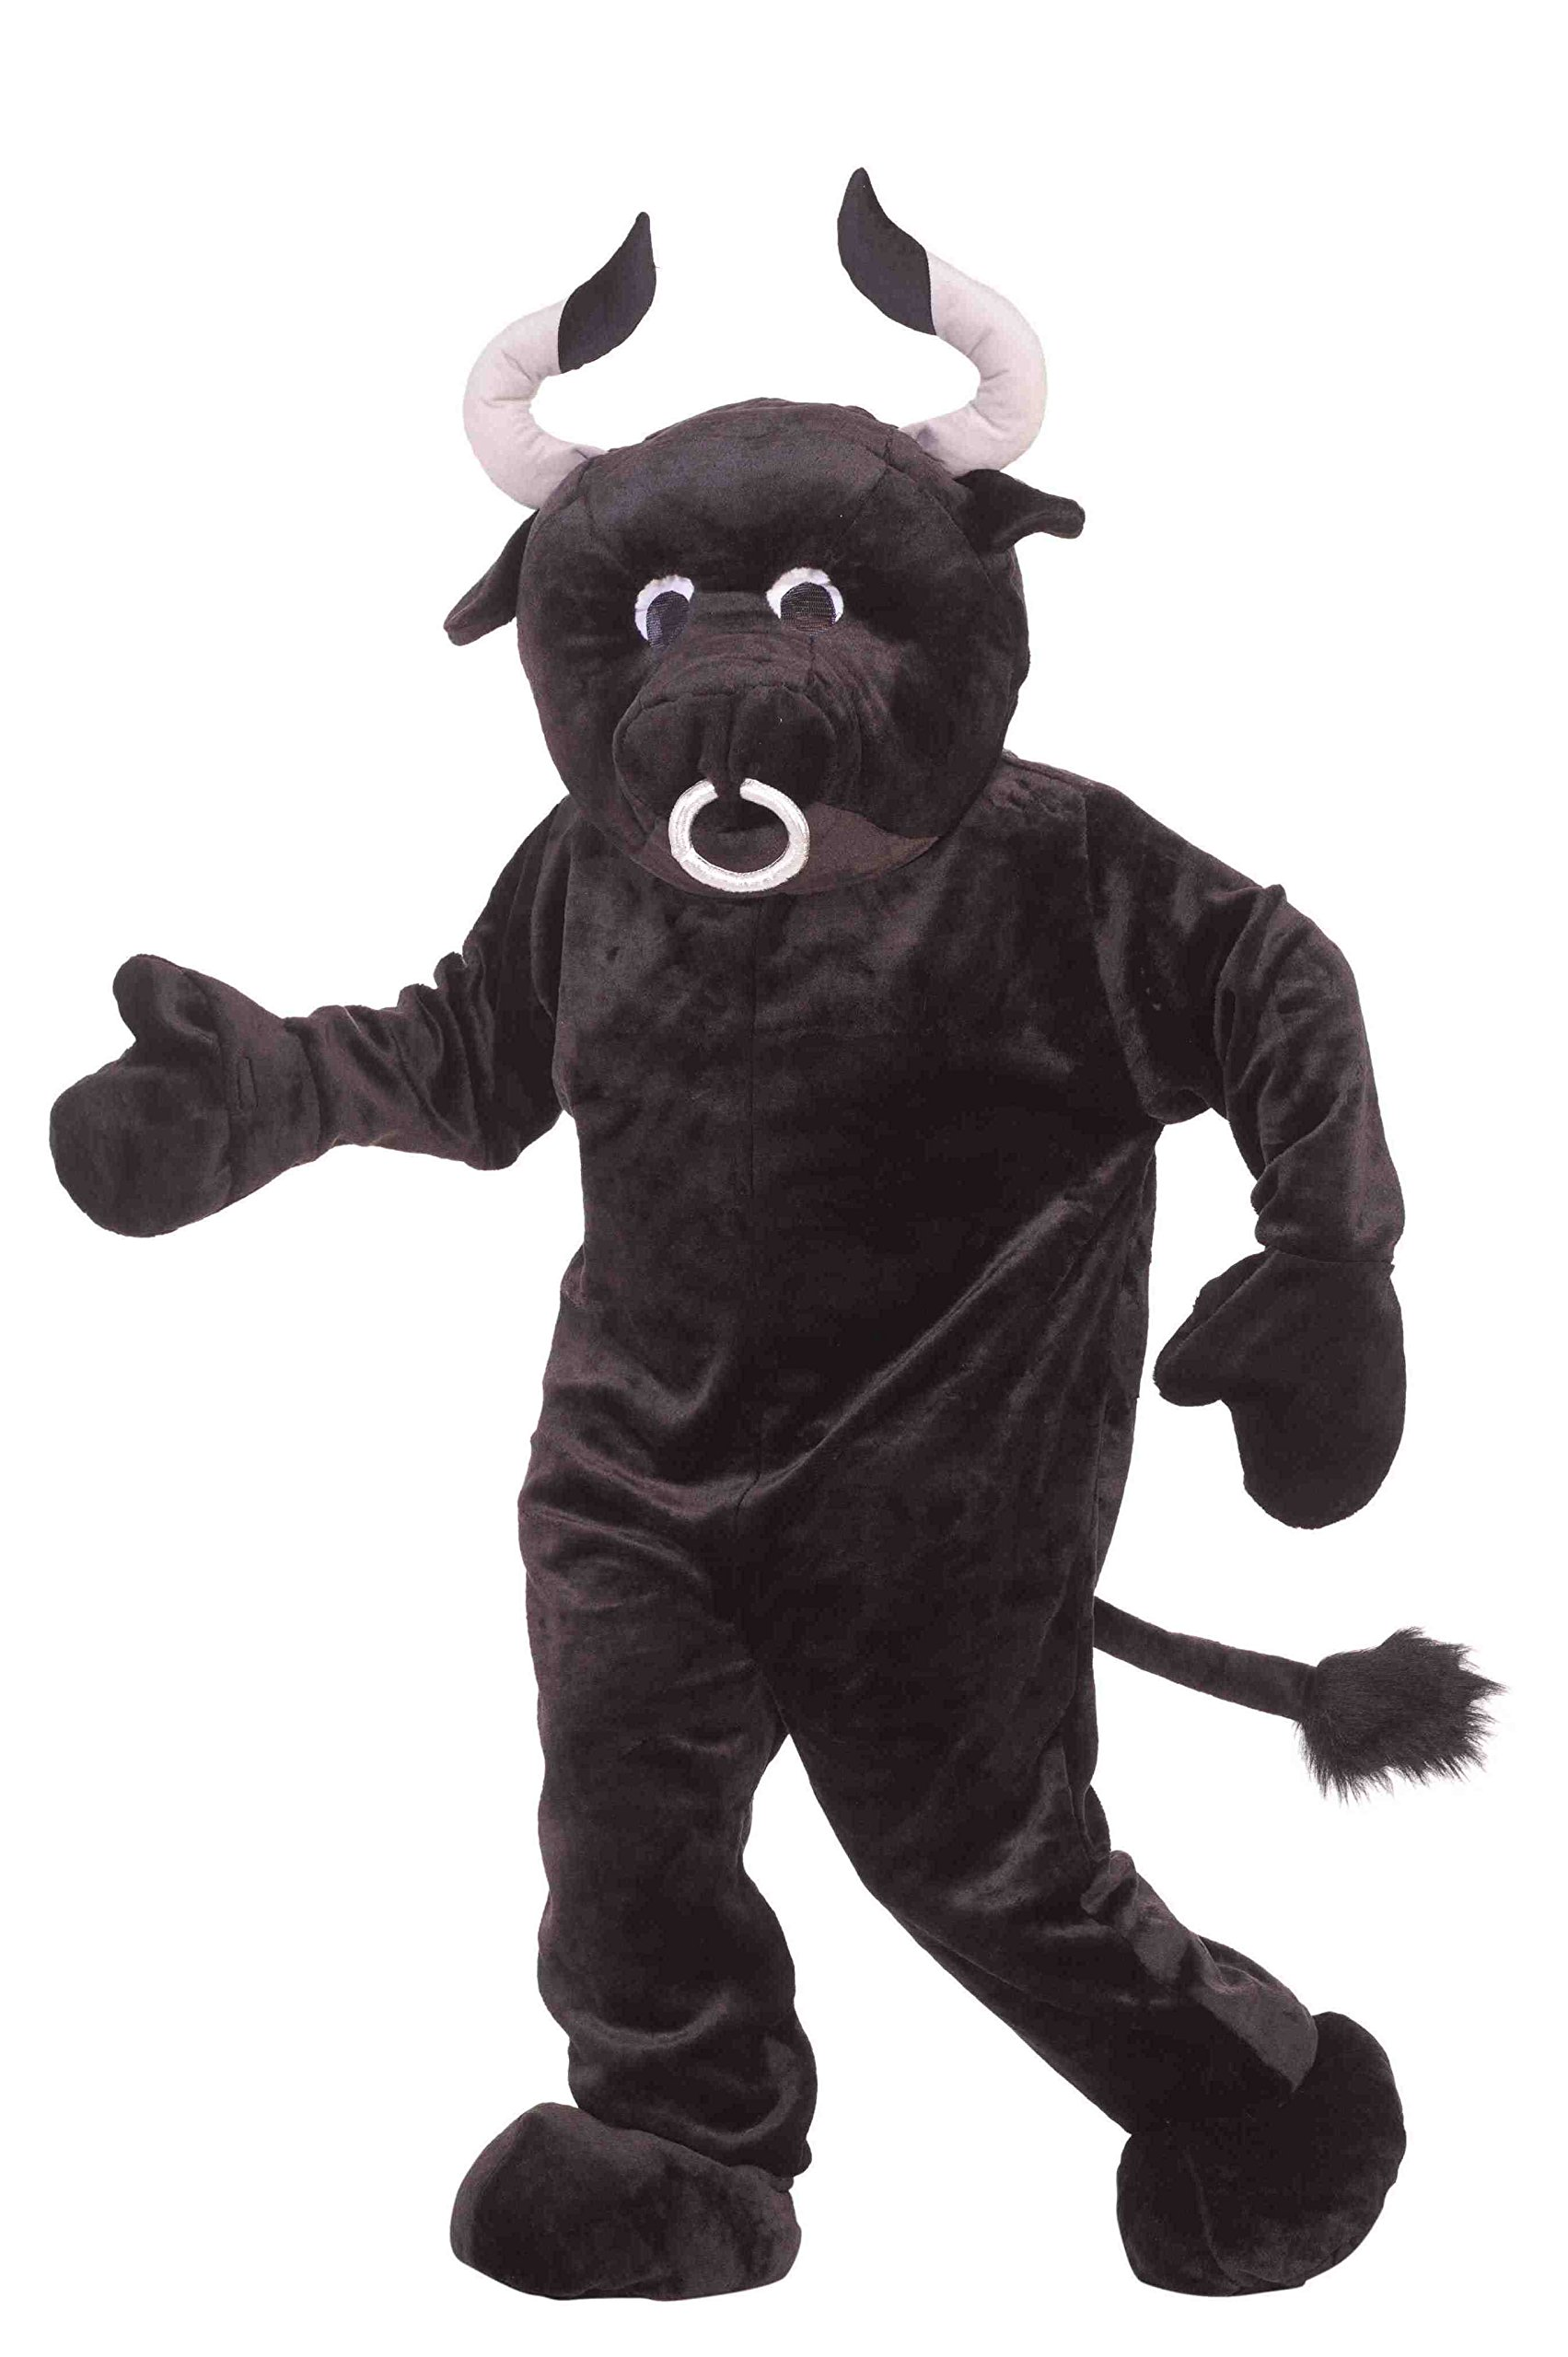 Forum Deluxe Plush Bull Costume, Black, One Size